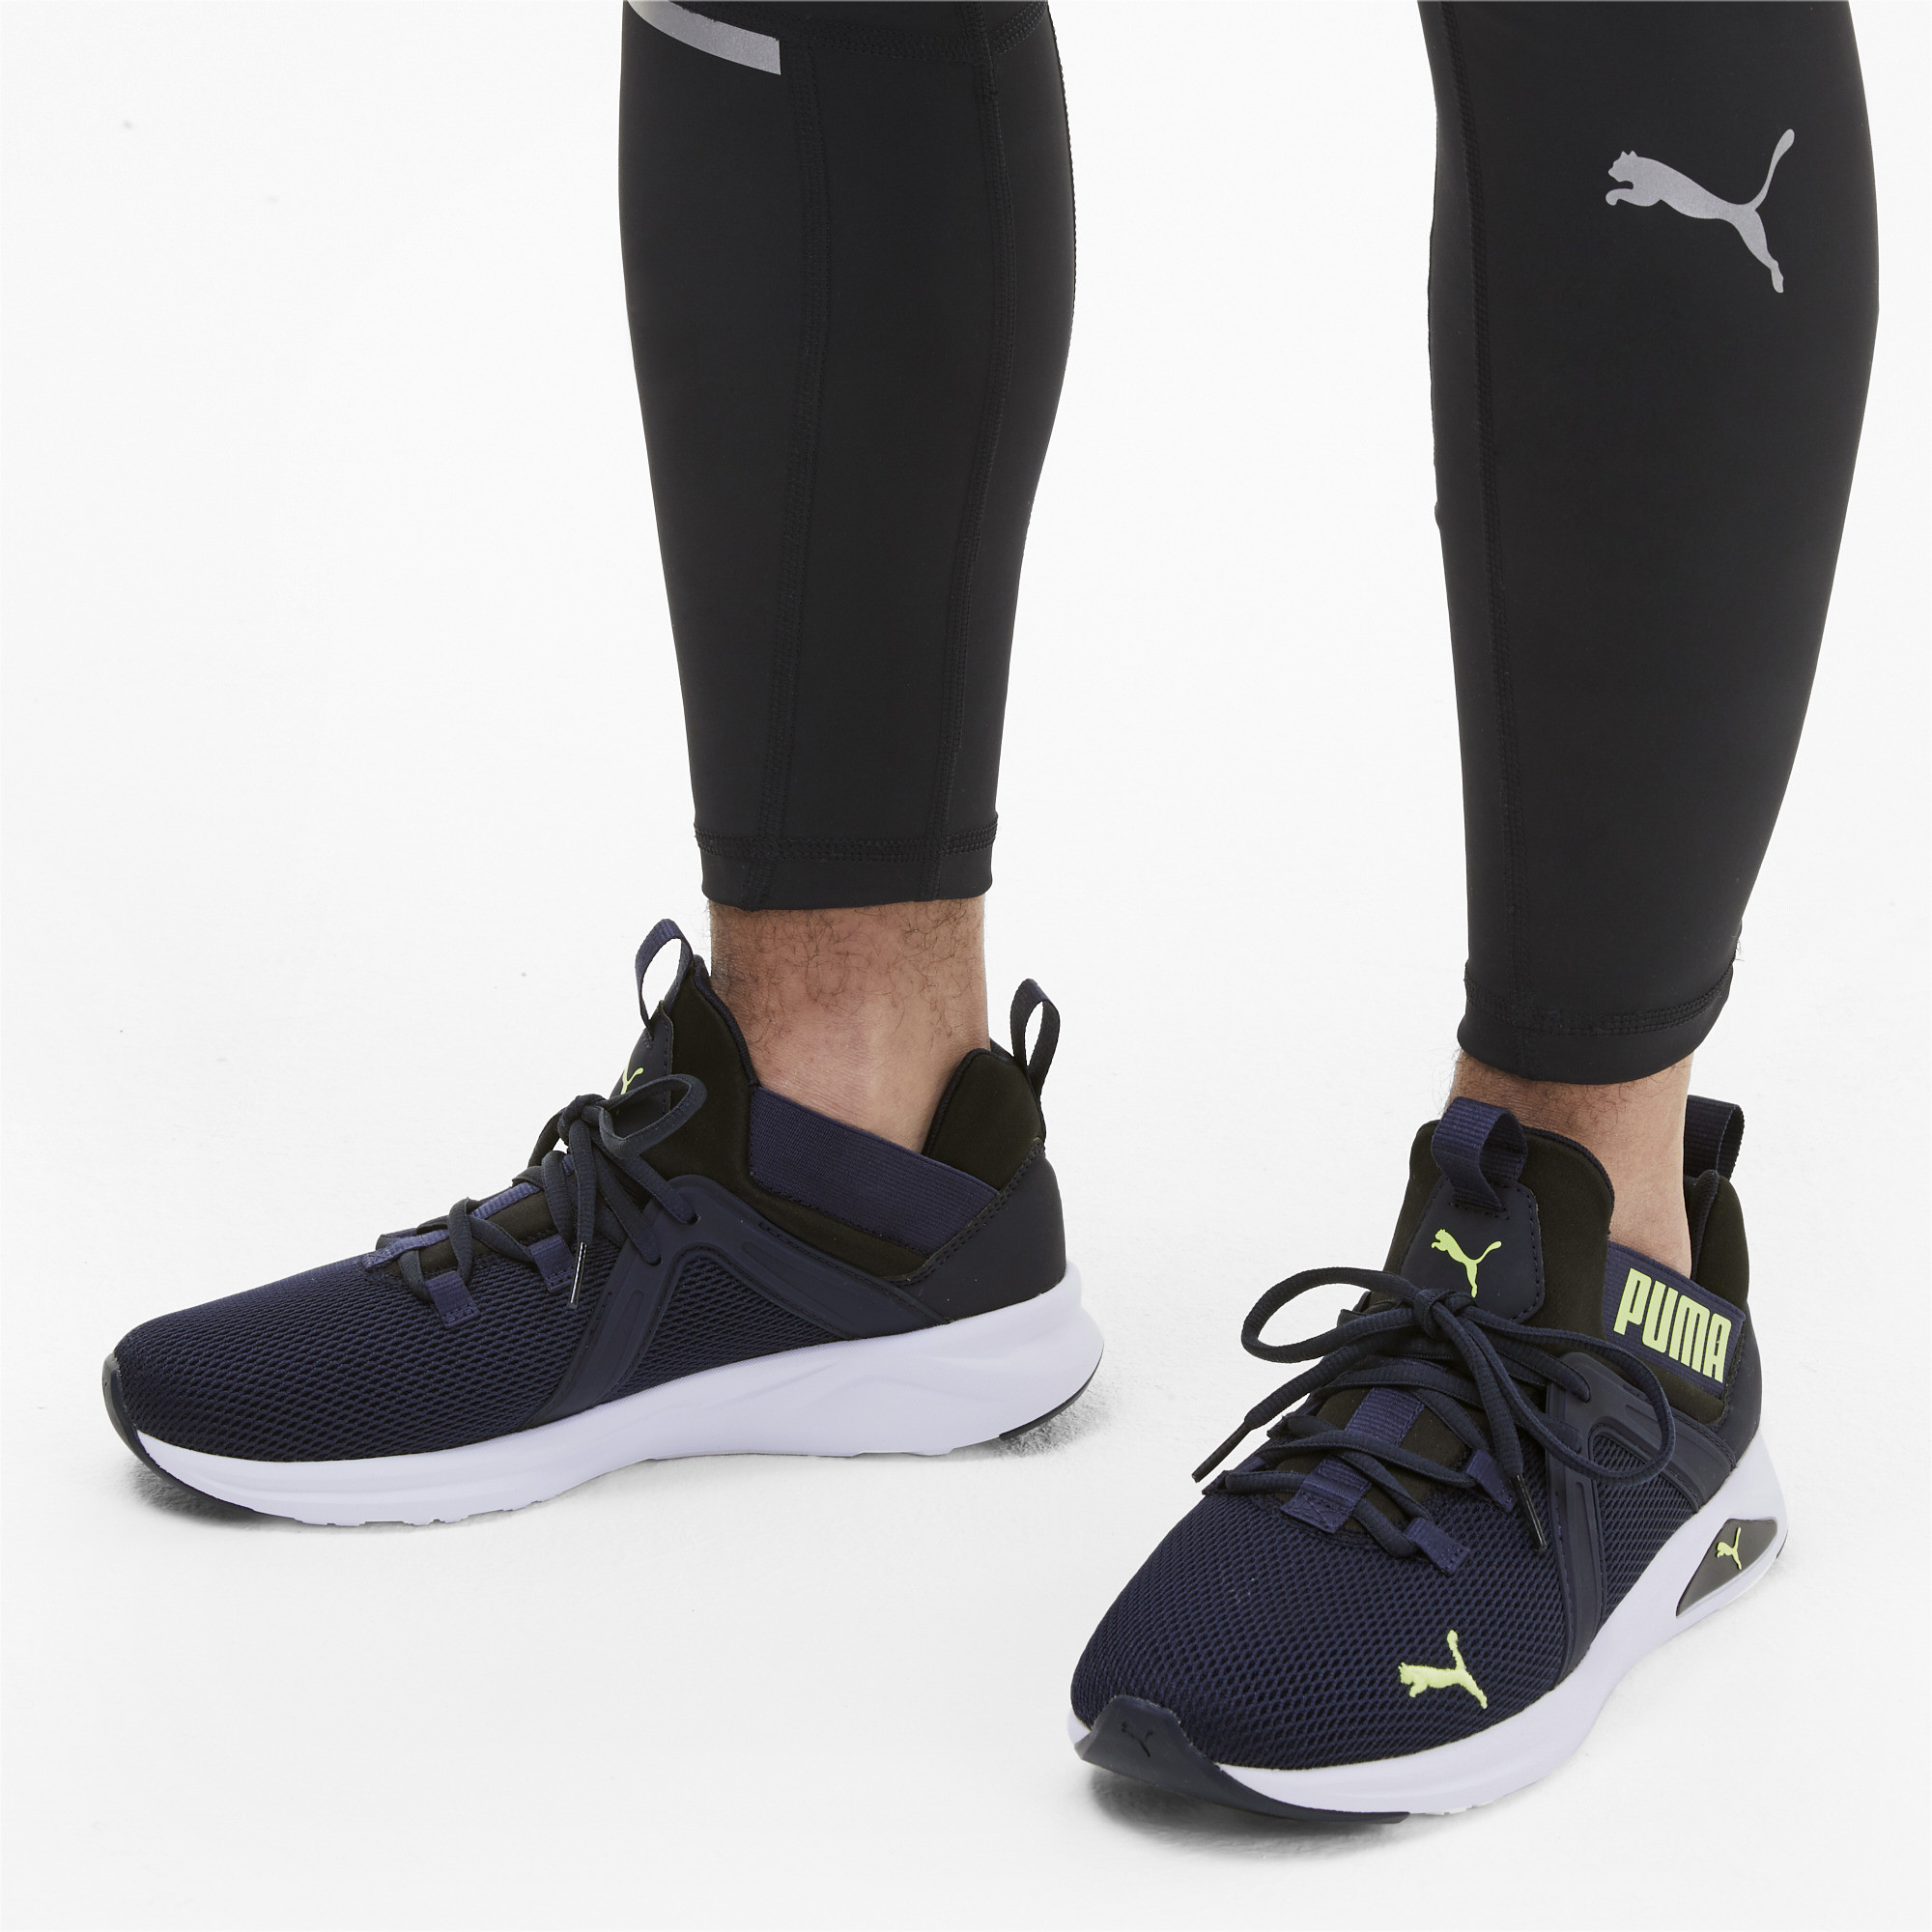 PUMA-Men-039-s-Enzo-2-Wide-Training-Shoes thumbnail 12